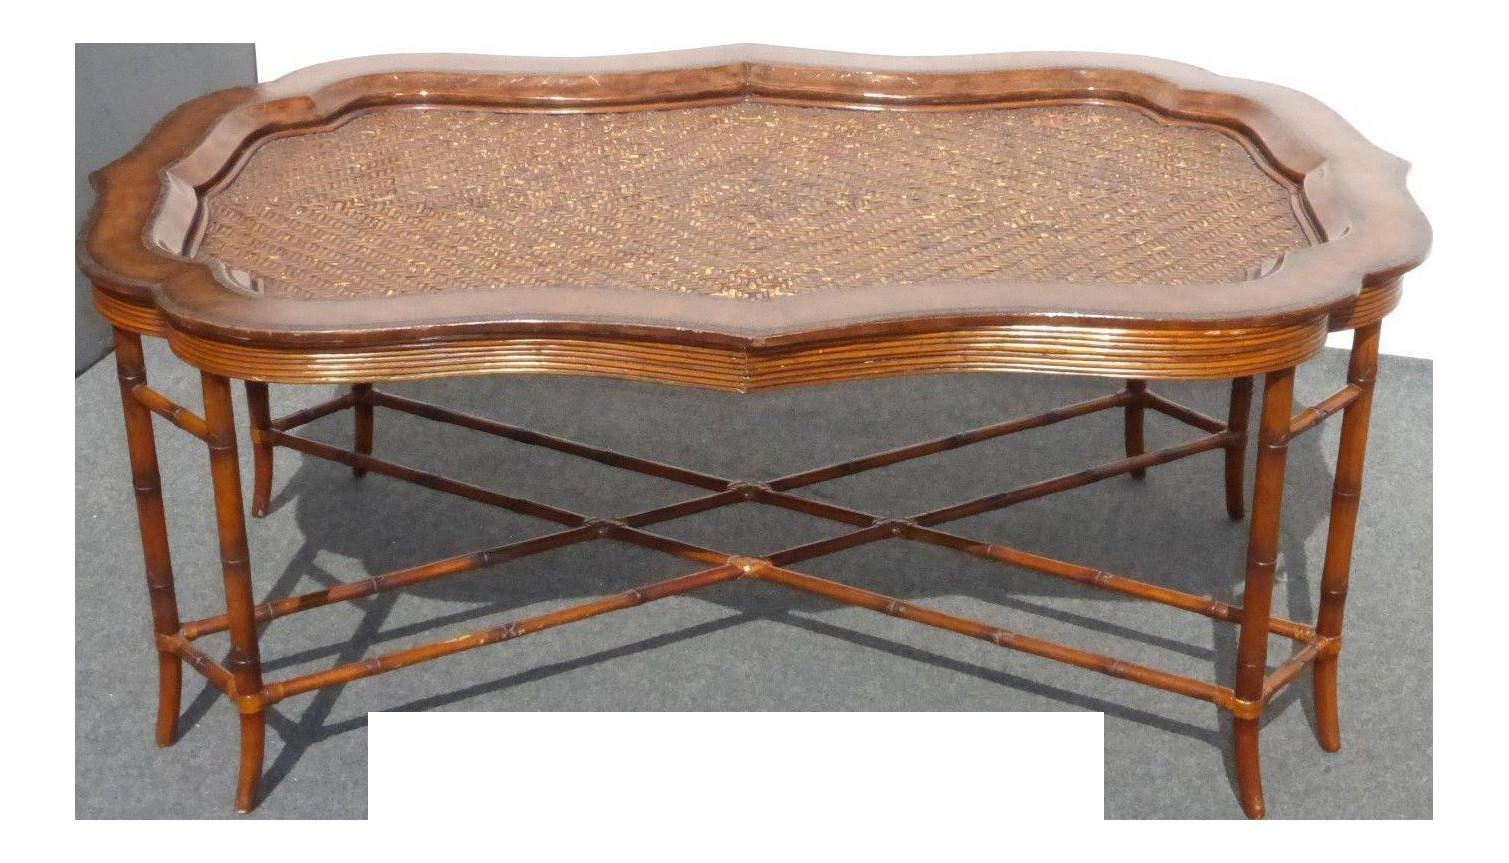 maitland smith ltd vase of maitland smith rattan leather coffee table chairish regarding maitland smith rattan and leather coffee table 0355